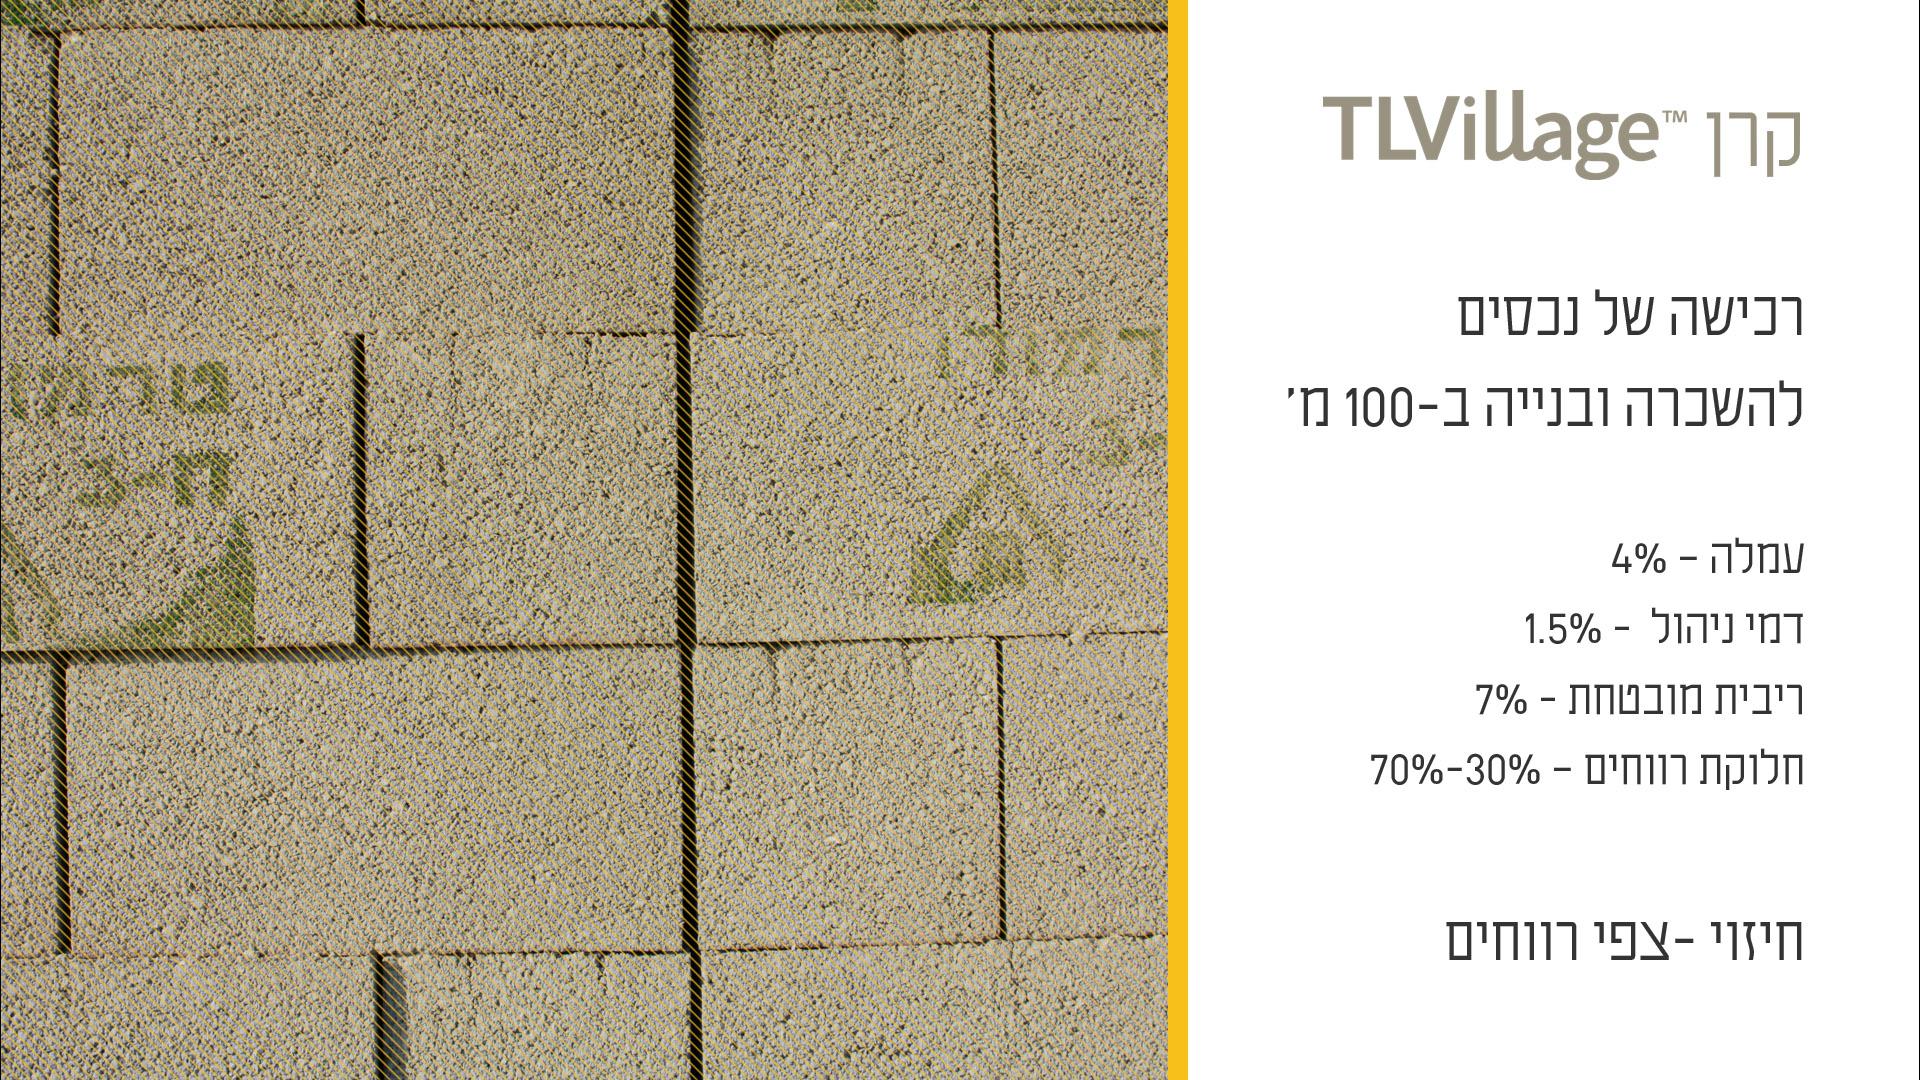 TLVillage 1